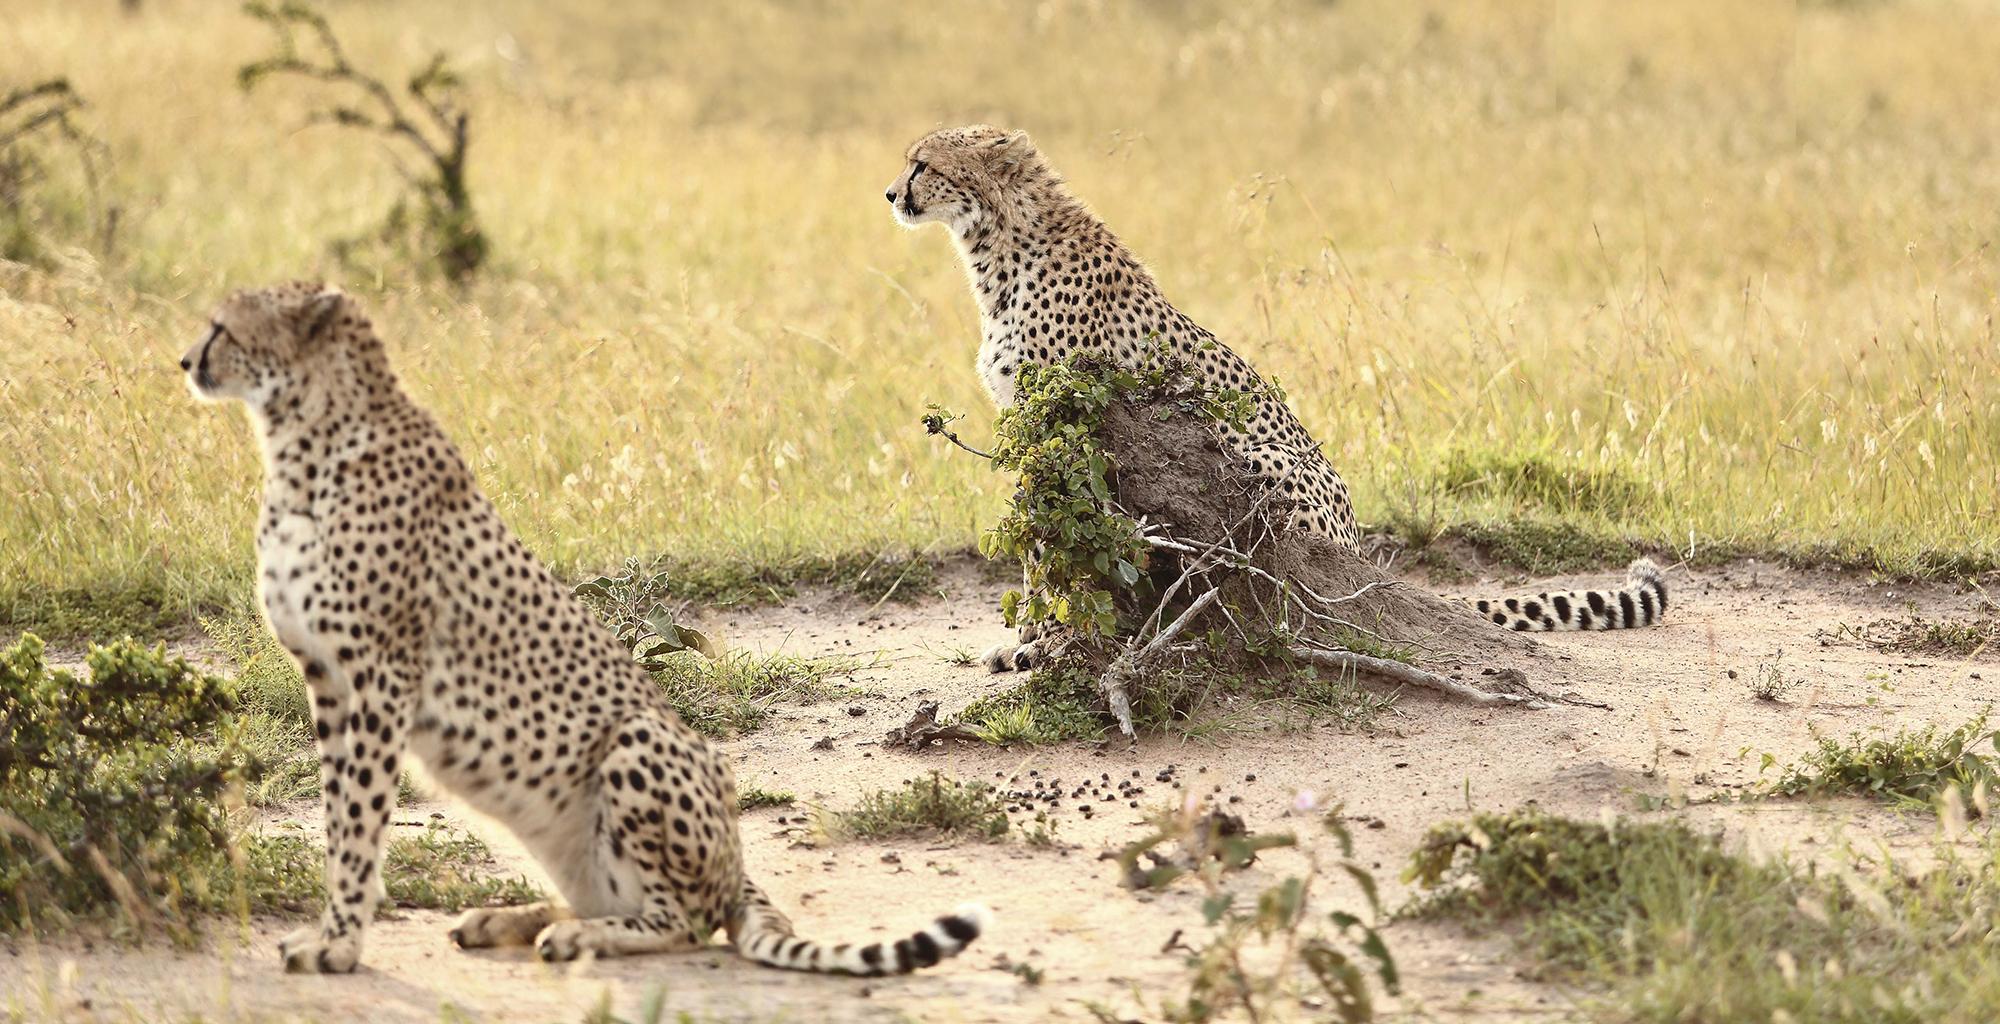 Kenya-Cottars-Private-House-Cheetah